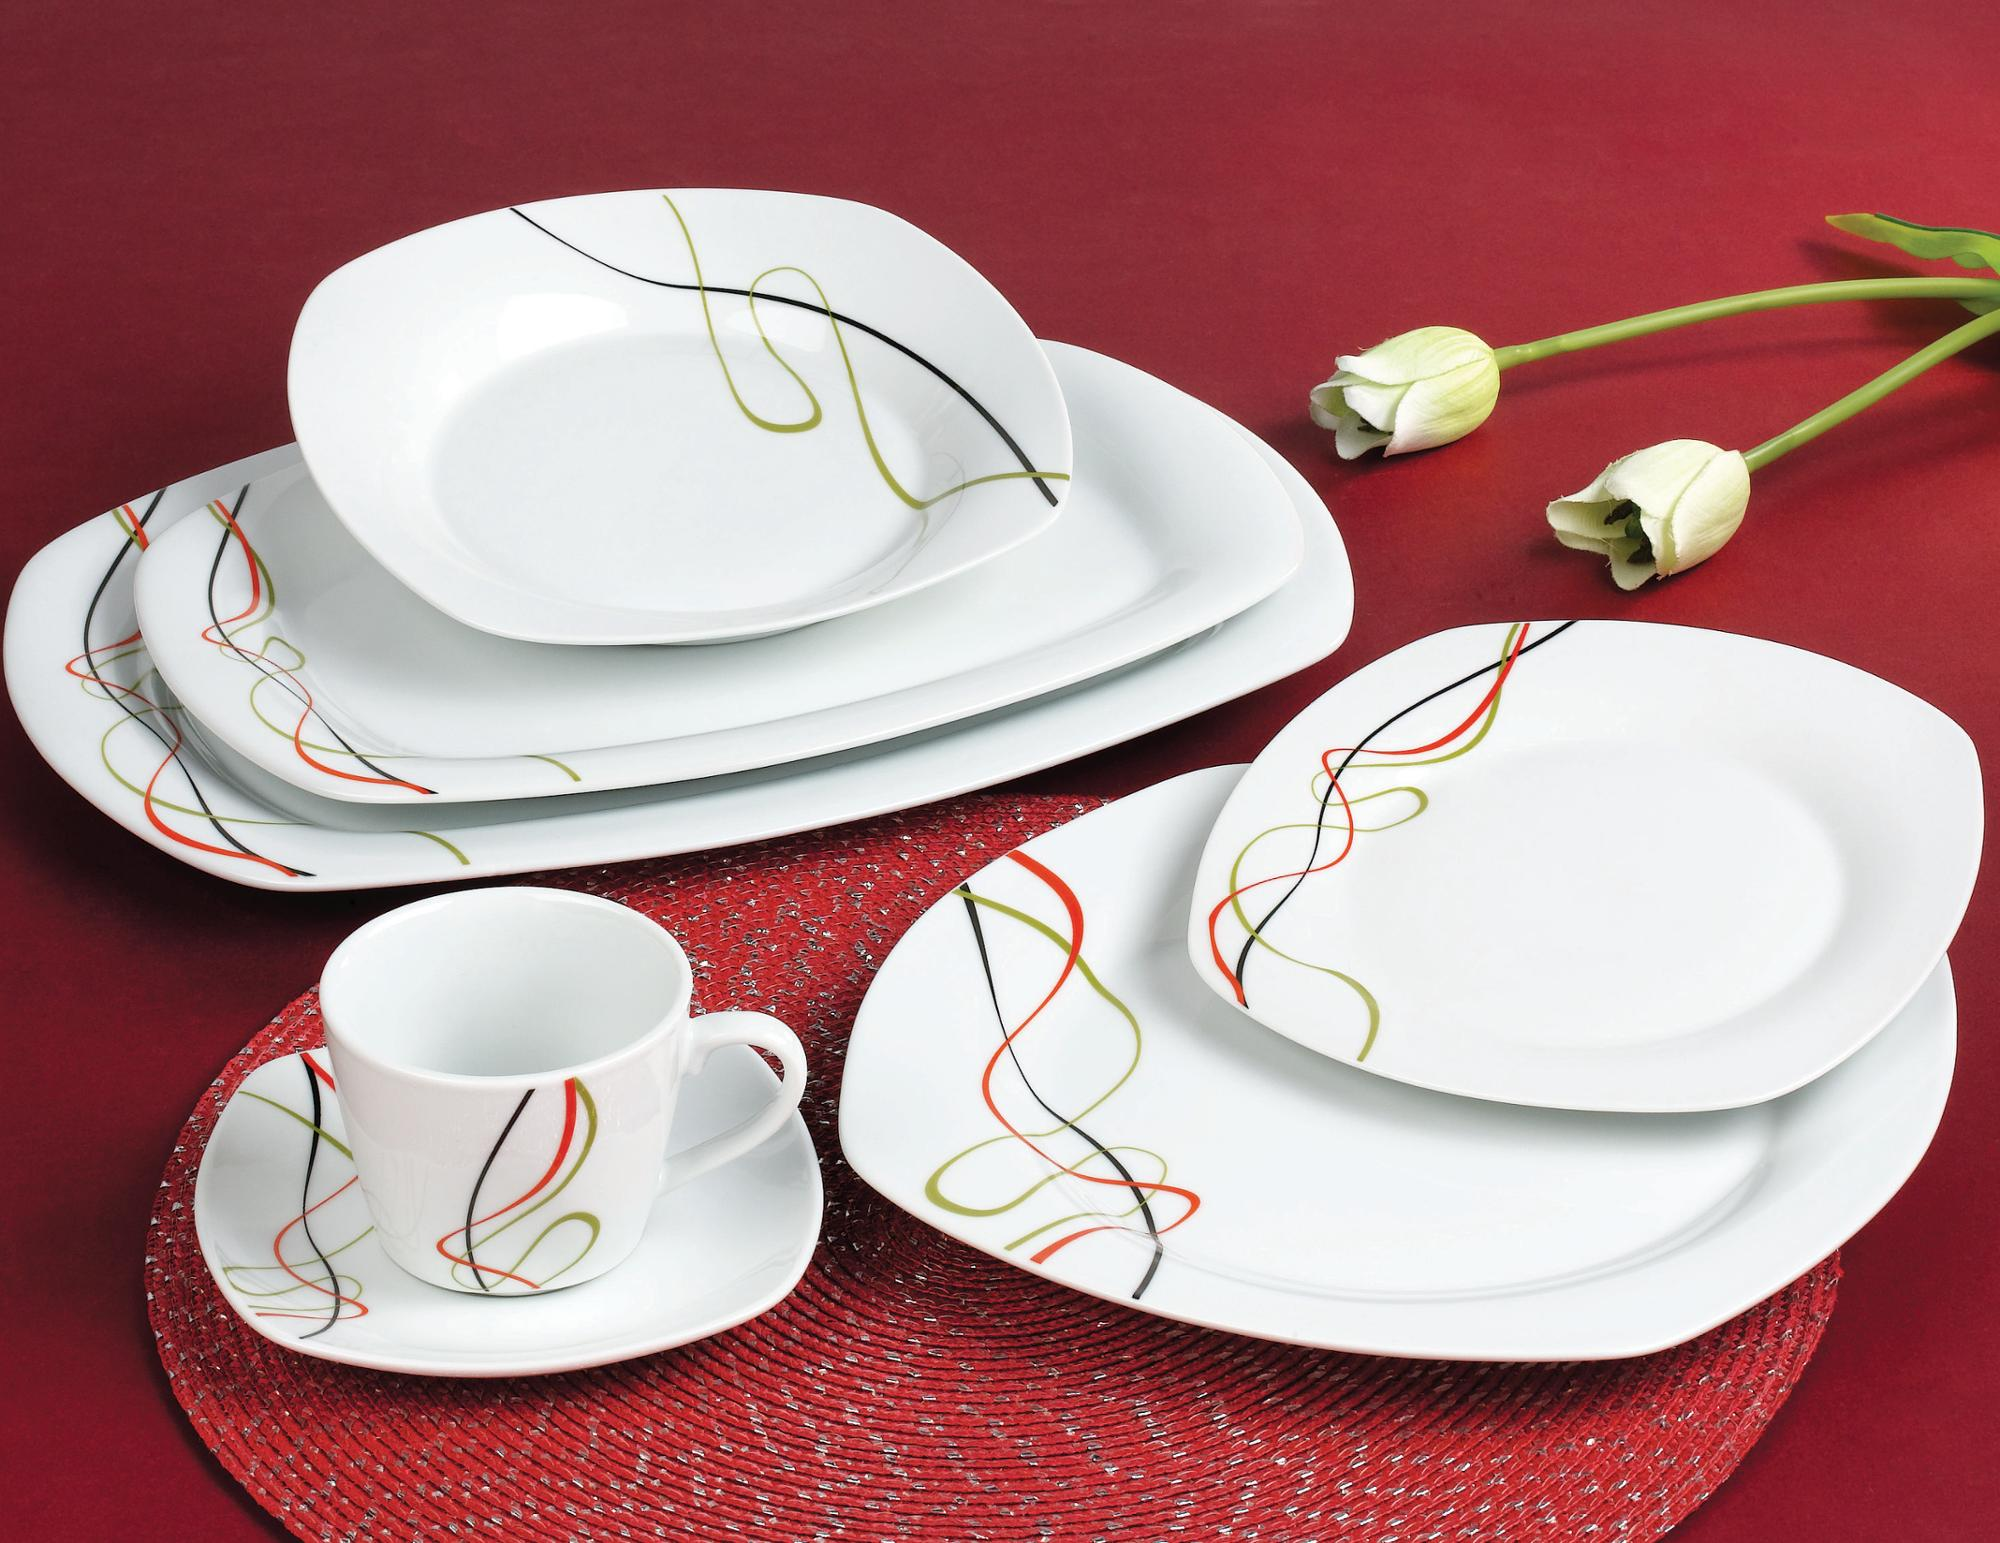 32pcs high quality super white porcelain dinnerware wholesale portuguese ceramic dinnerware & 32pcs High Quality Super White Porcelain Dinnerware Wholesale ...